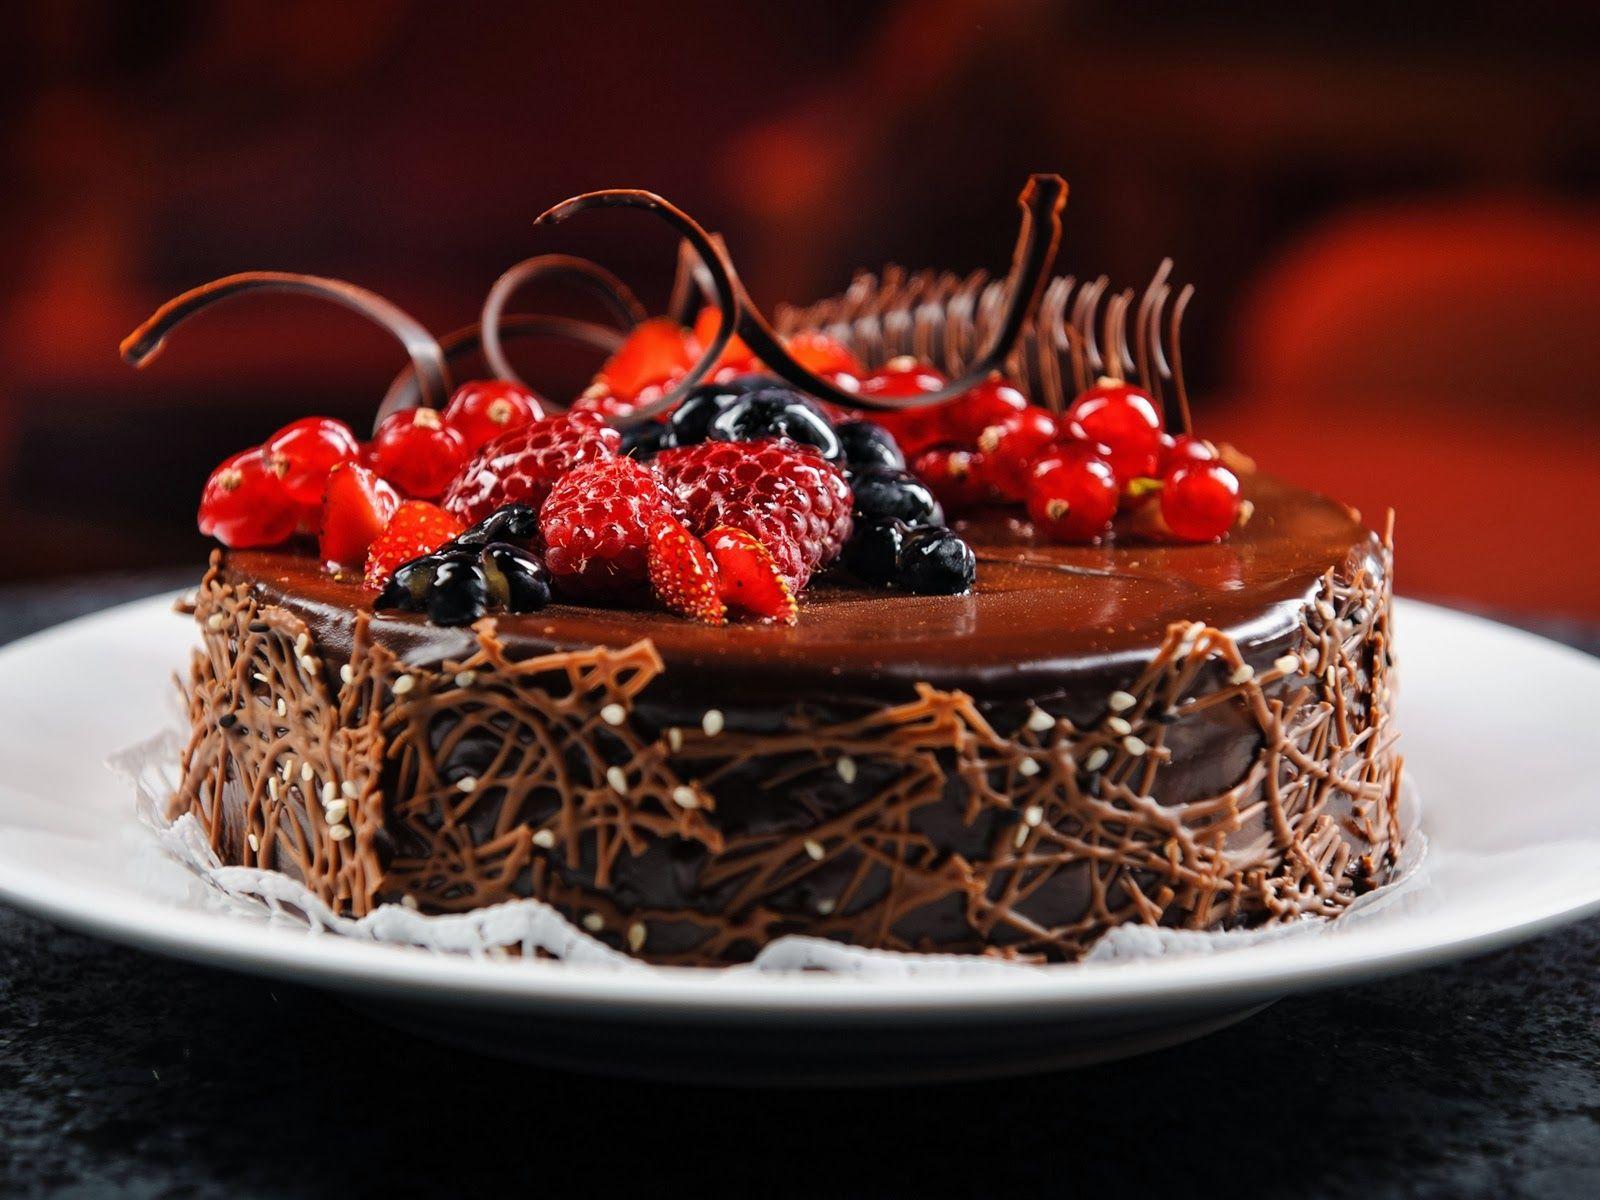 Group of Beautiful Chocolate Cake Hd